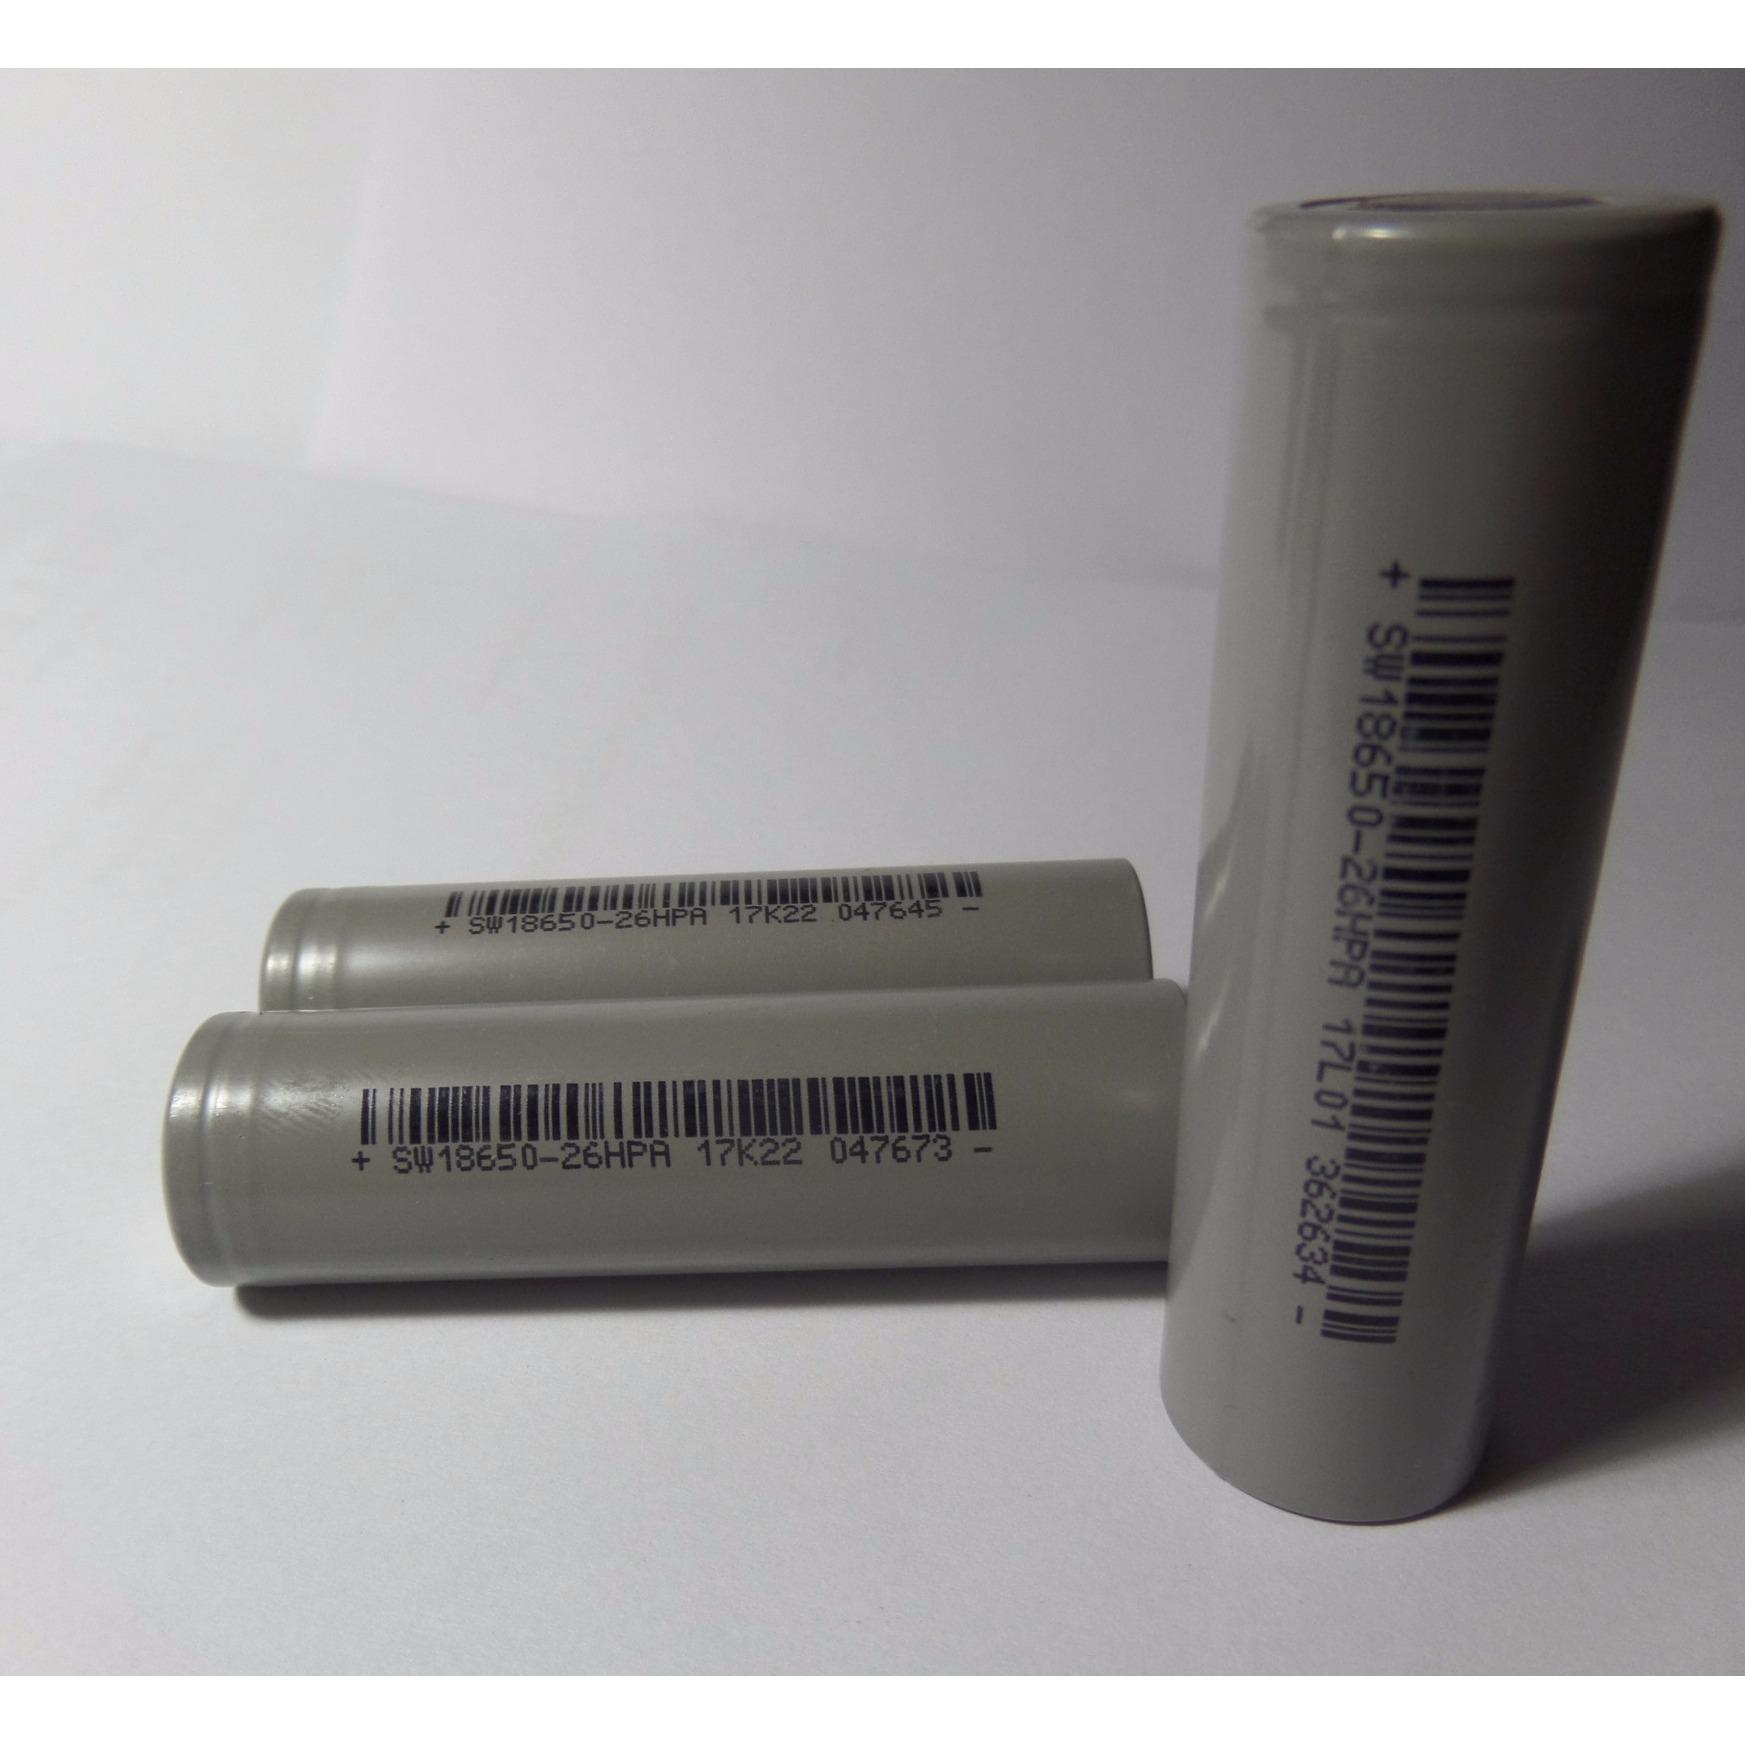 COMBO 3 Cell Pin Sinowatt (Xám) - SW18650 - dung lượng 2500mAh - dòng xả 10A